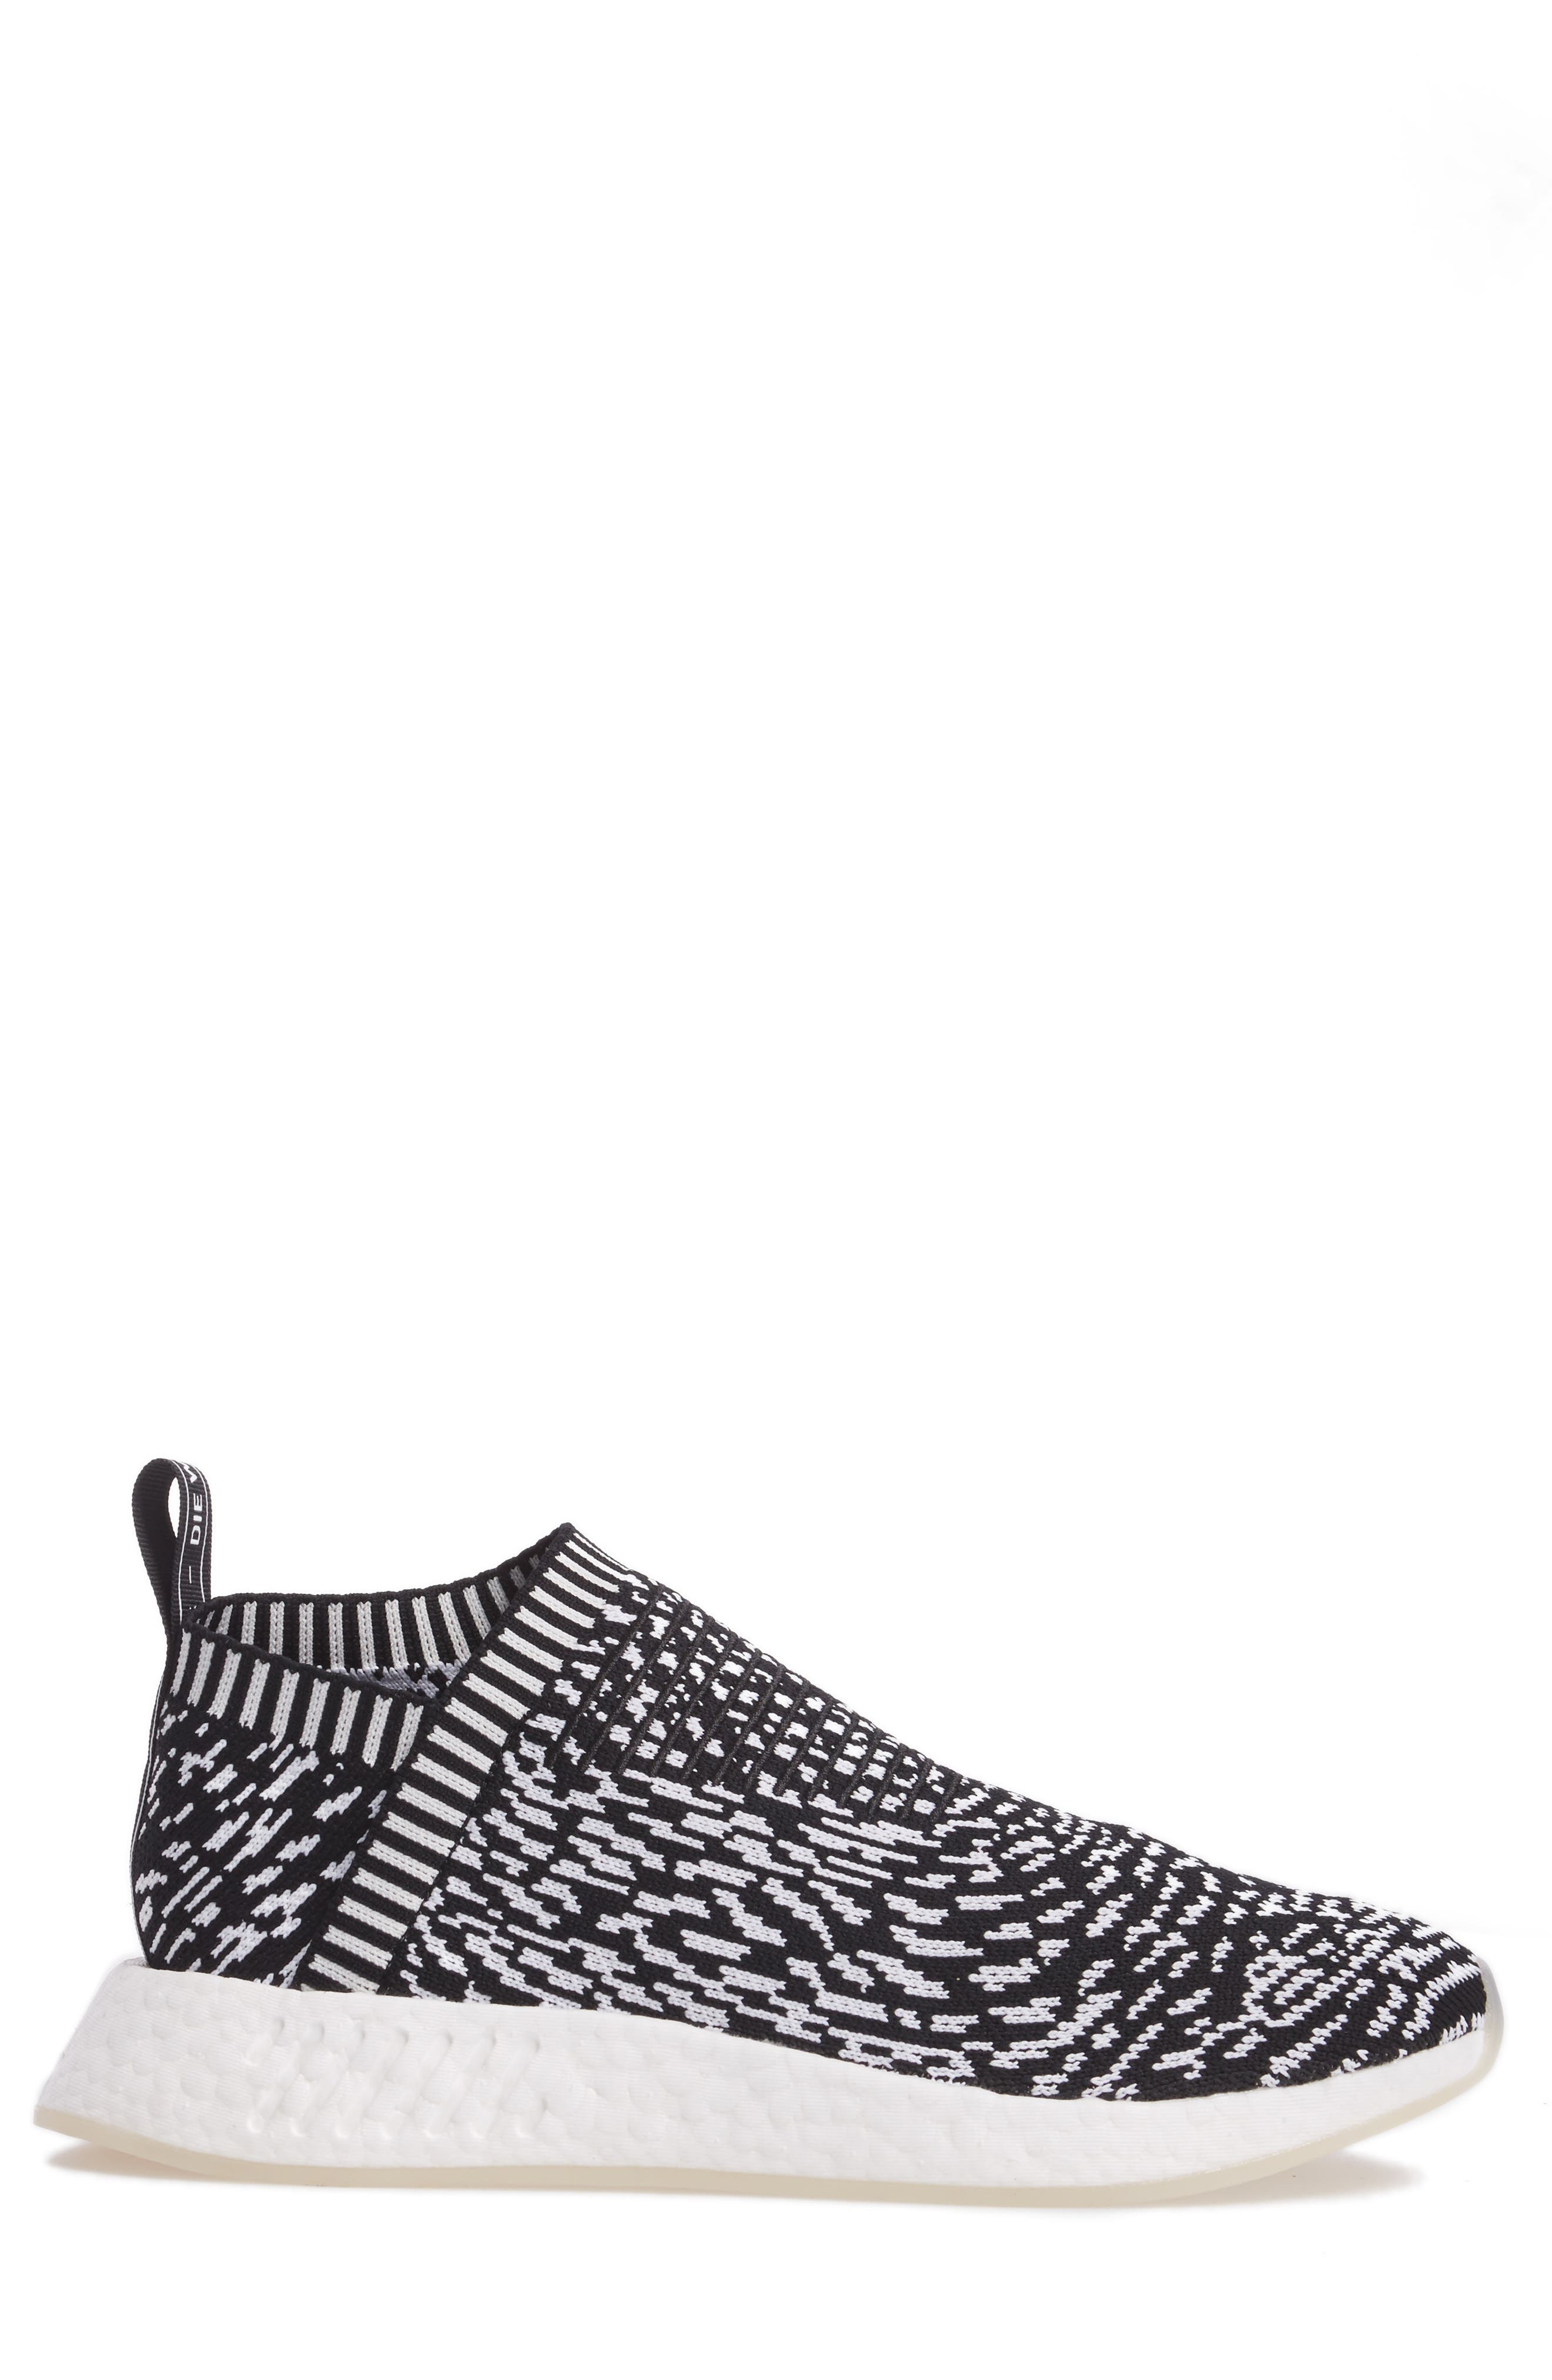 Alternate Image 3  - adidas NMD_CS2 Primeknit Sneaker (Men)